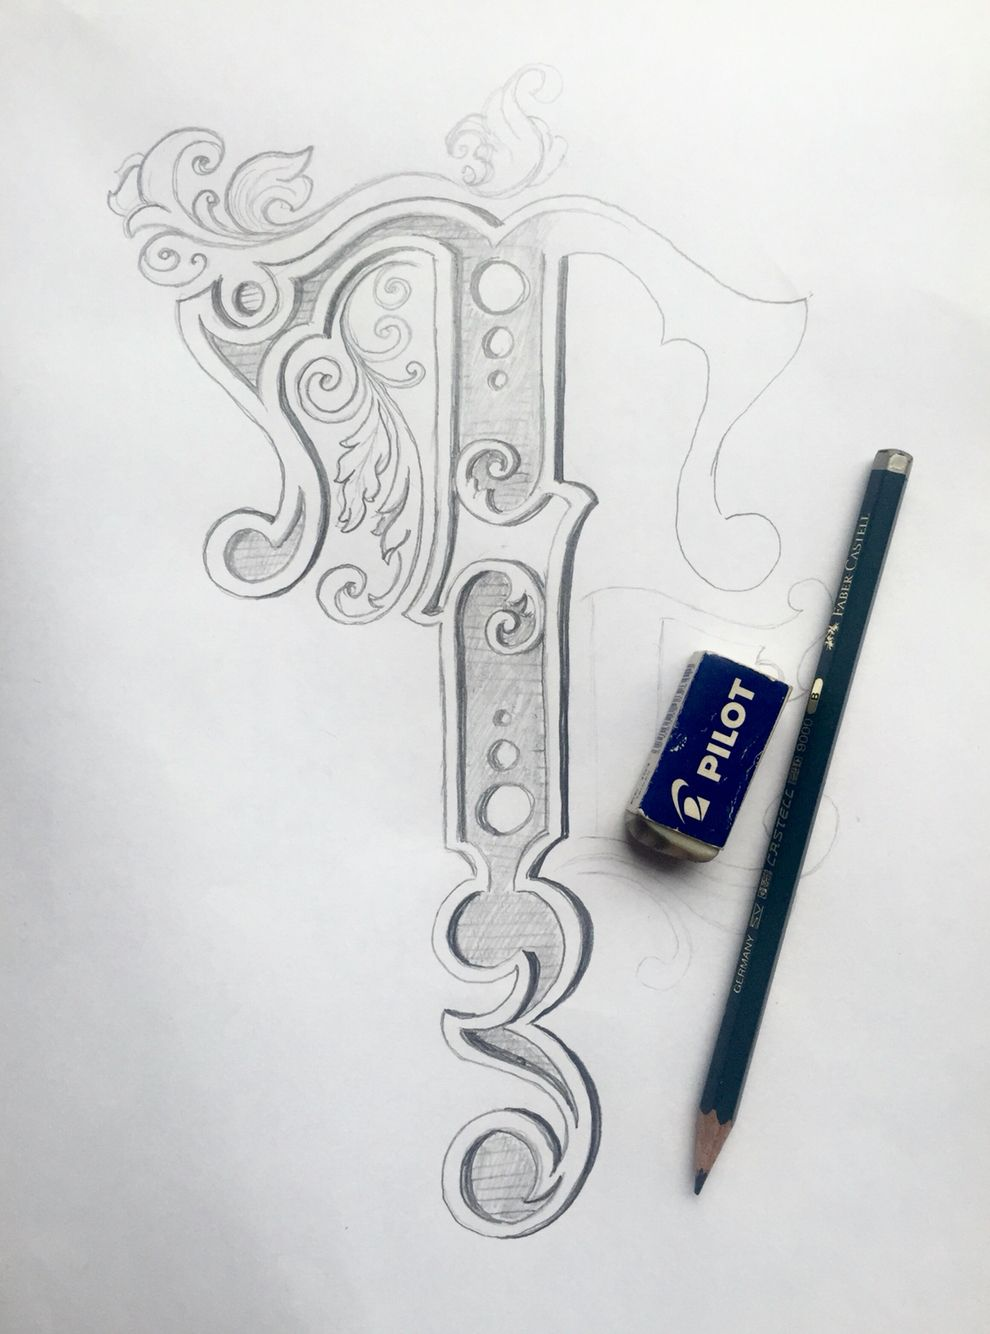 Pencil sketch of a letter t in progress